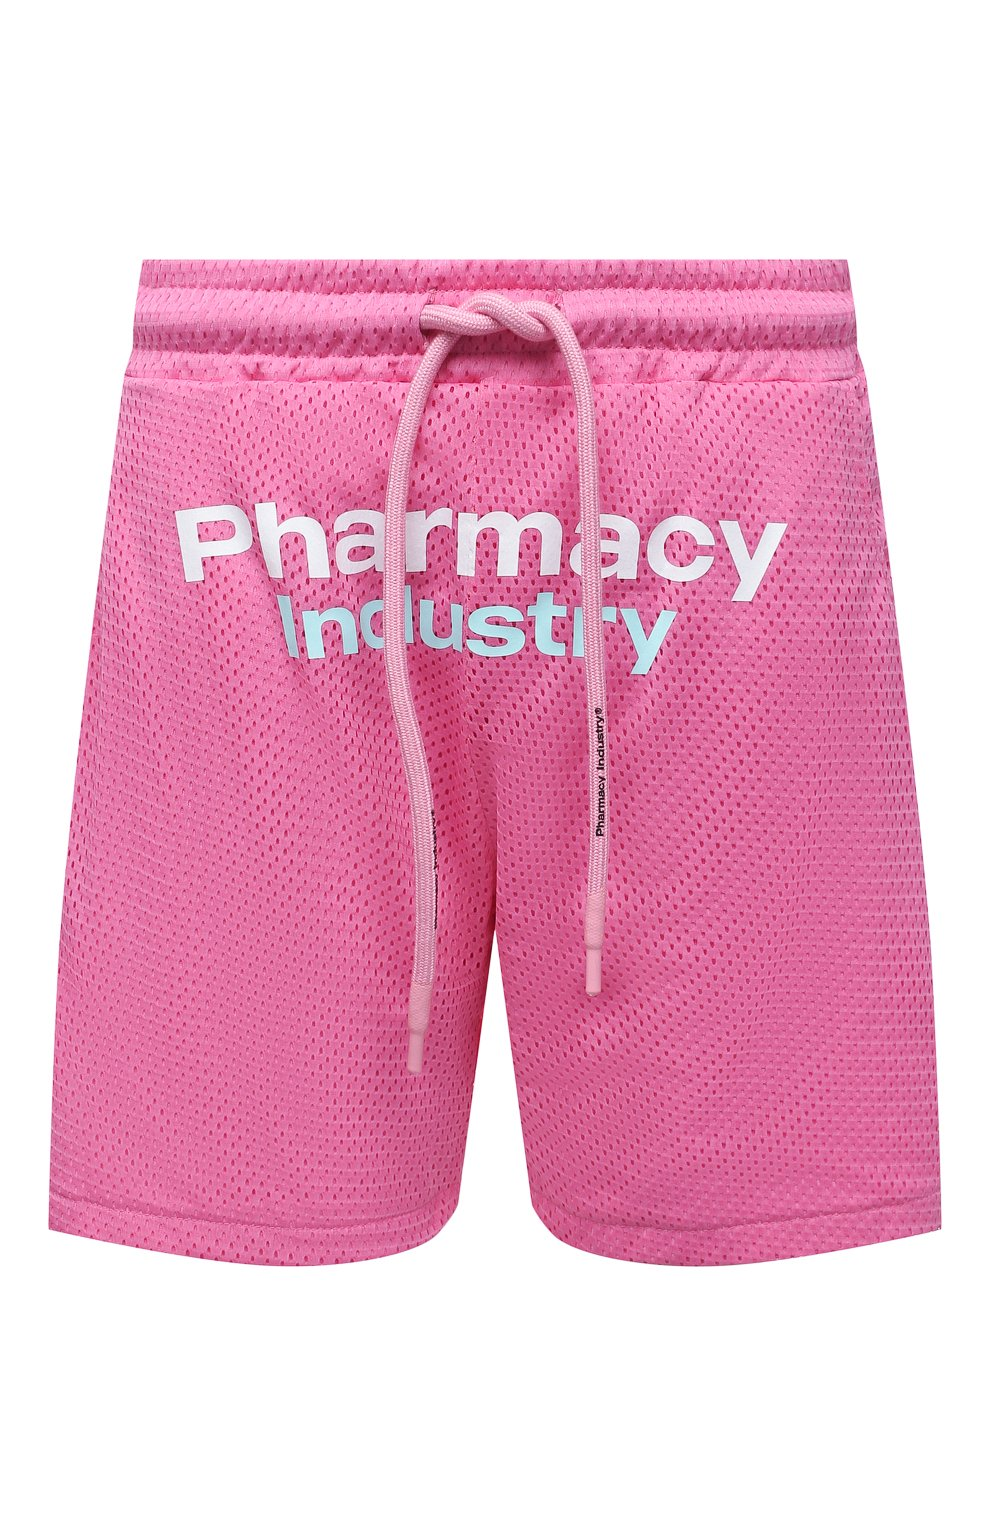 Мужские шорты PHARMACY INDUSTRY розового цвета, арт. PHM230 | Фото 1